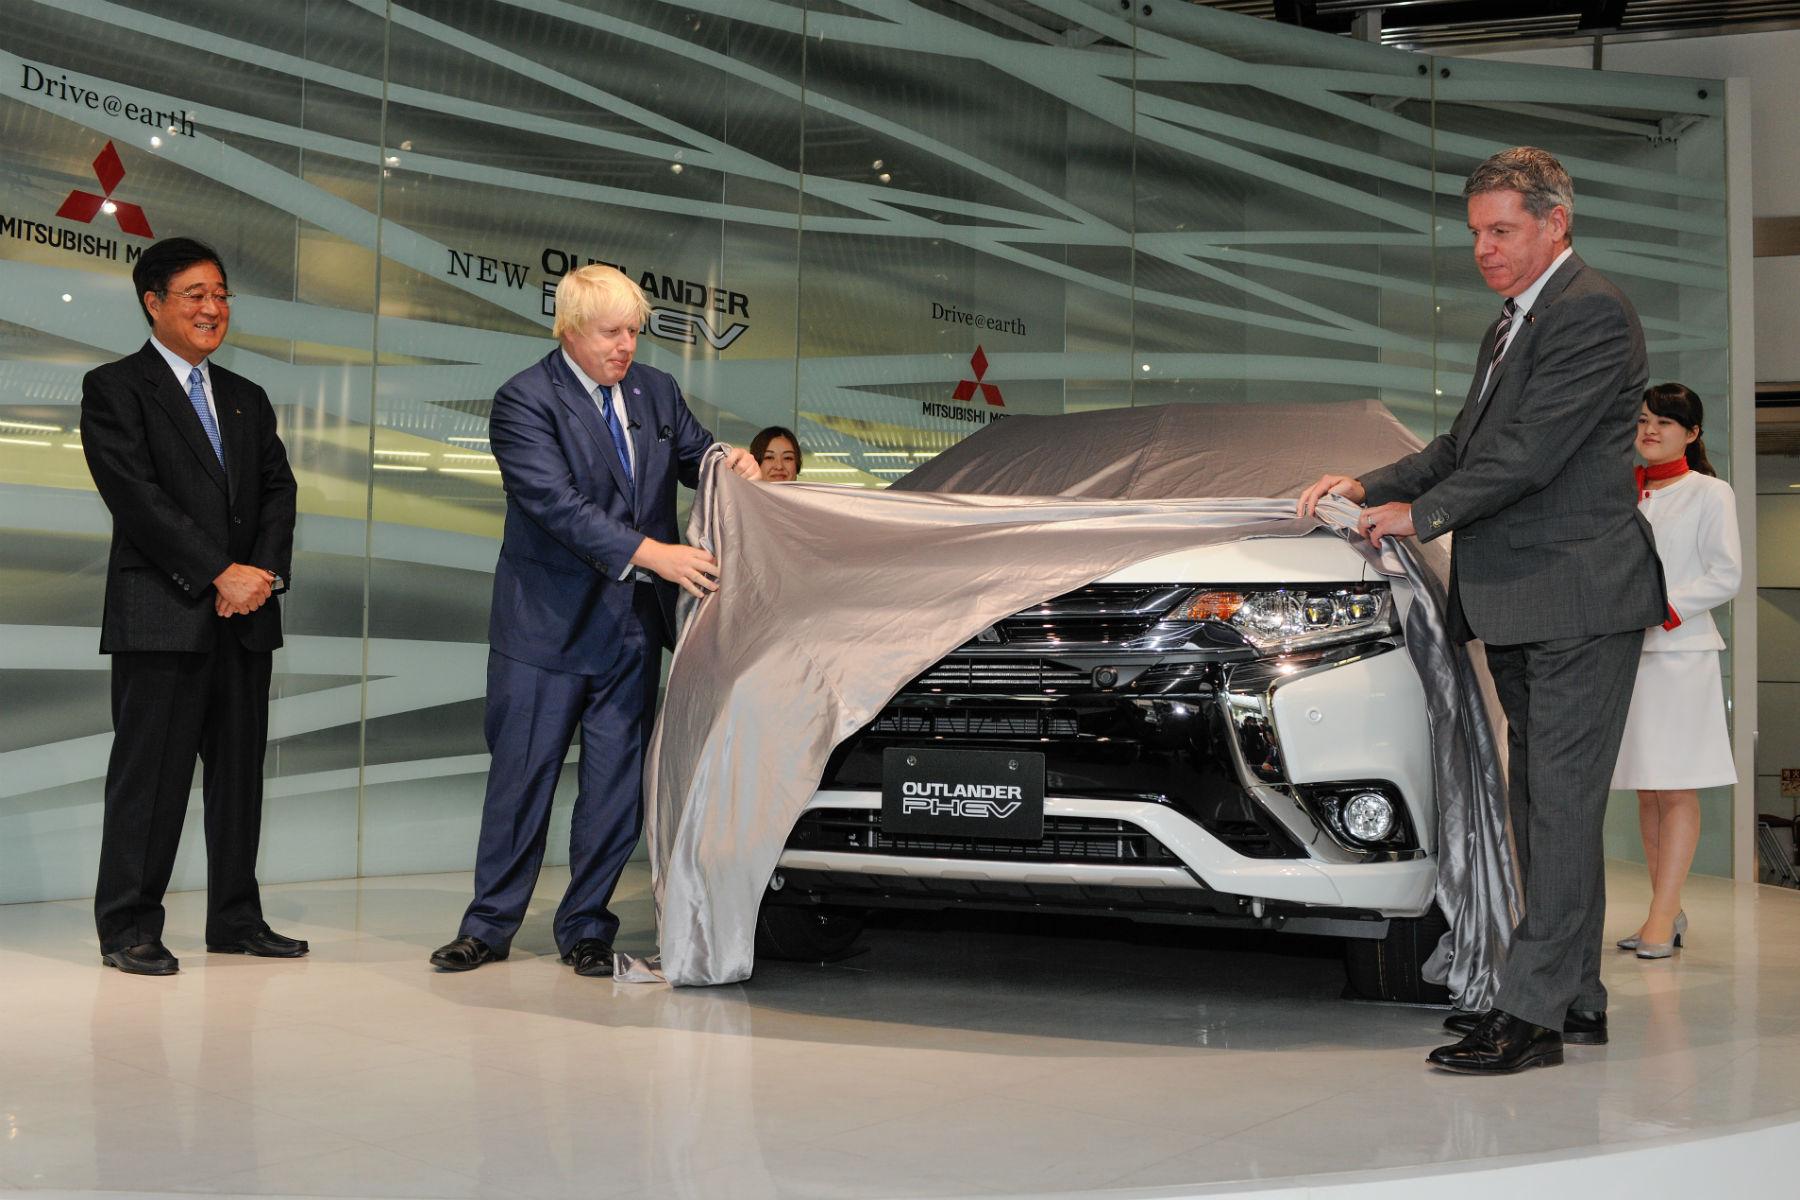 Boris Johnson takes covers off new Mitsubishi Outlander PHEV